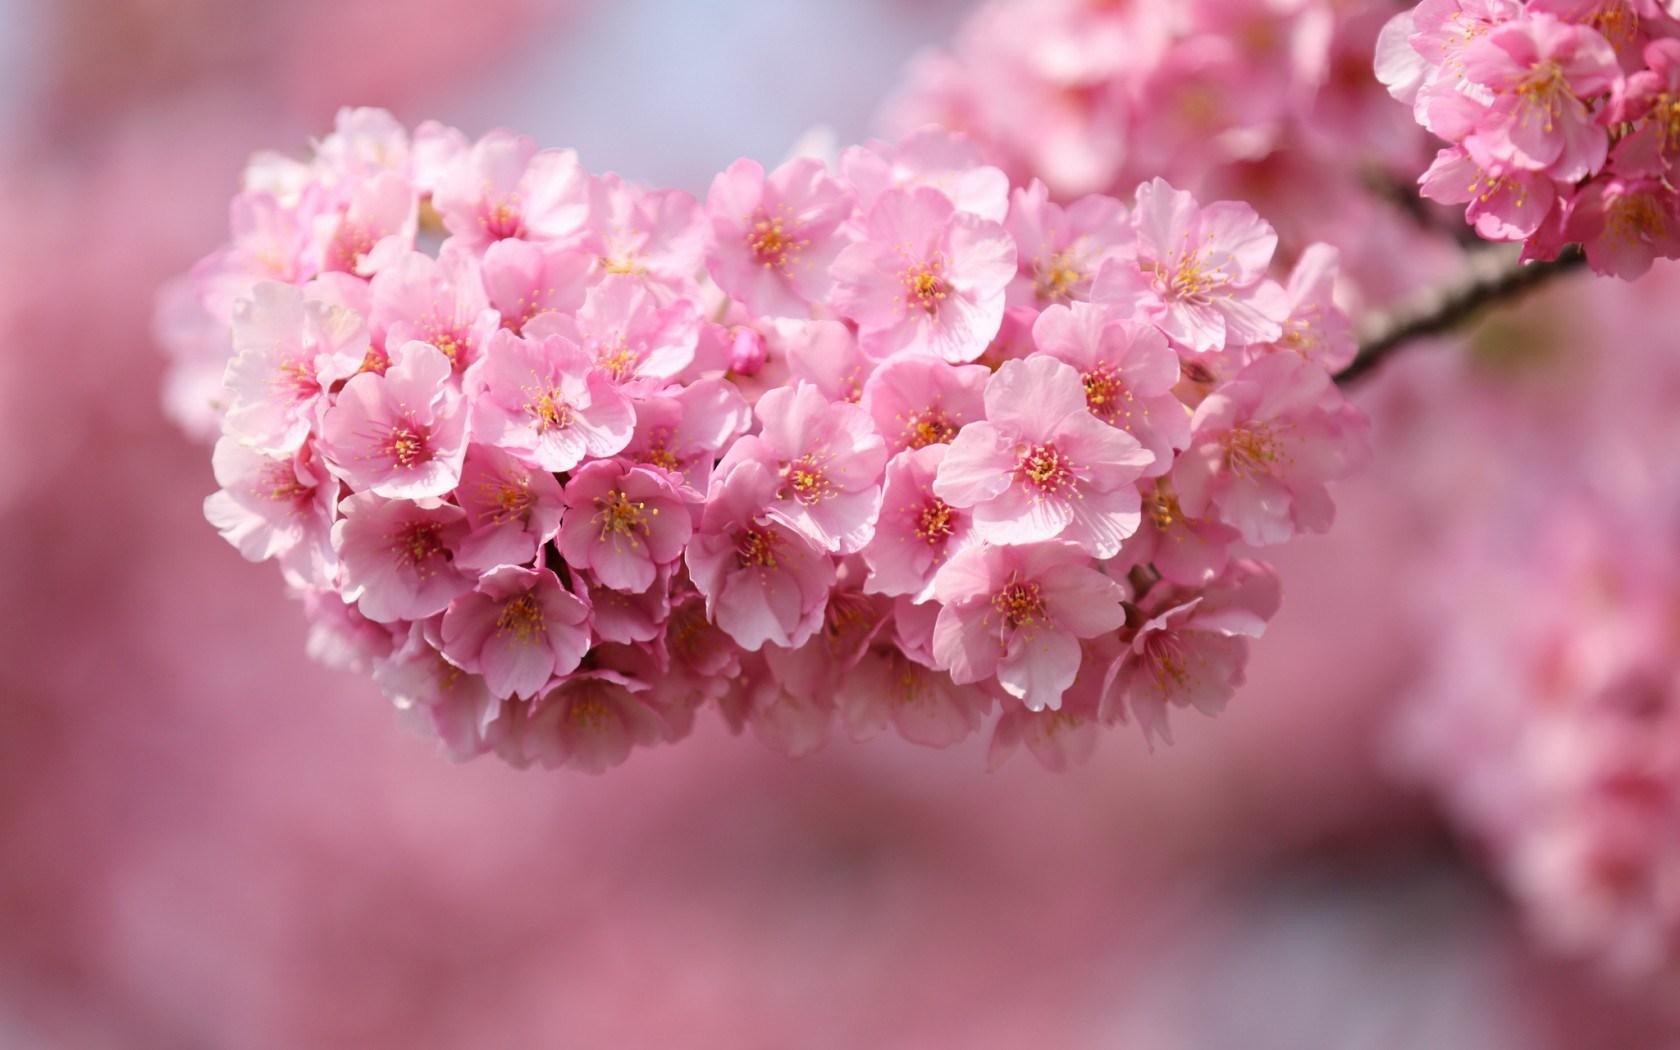 6905714-cherry-flowers-pink-petals-twigs-close-up.jpg